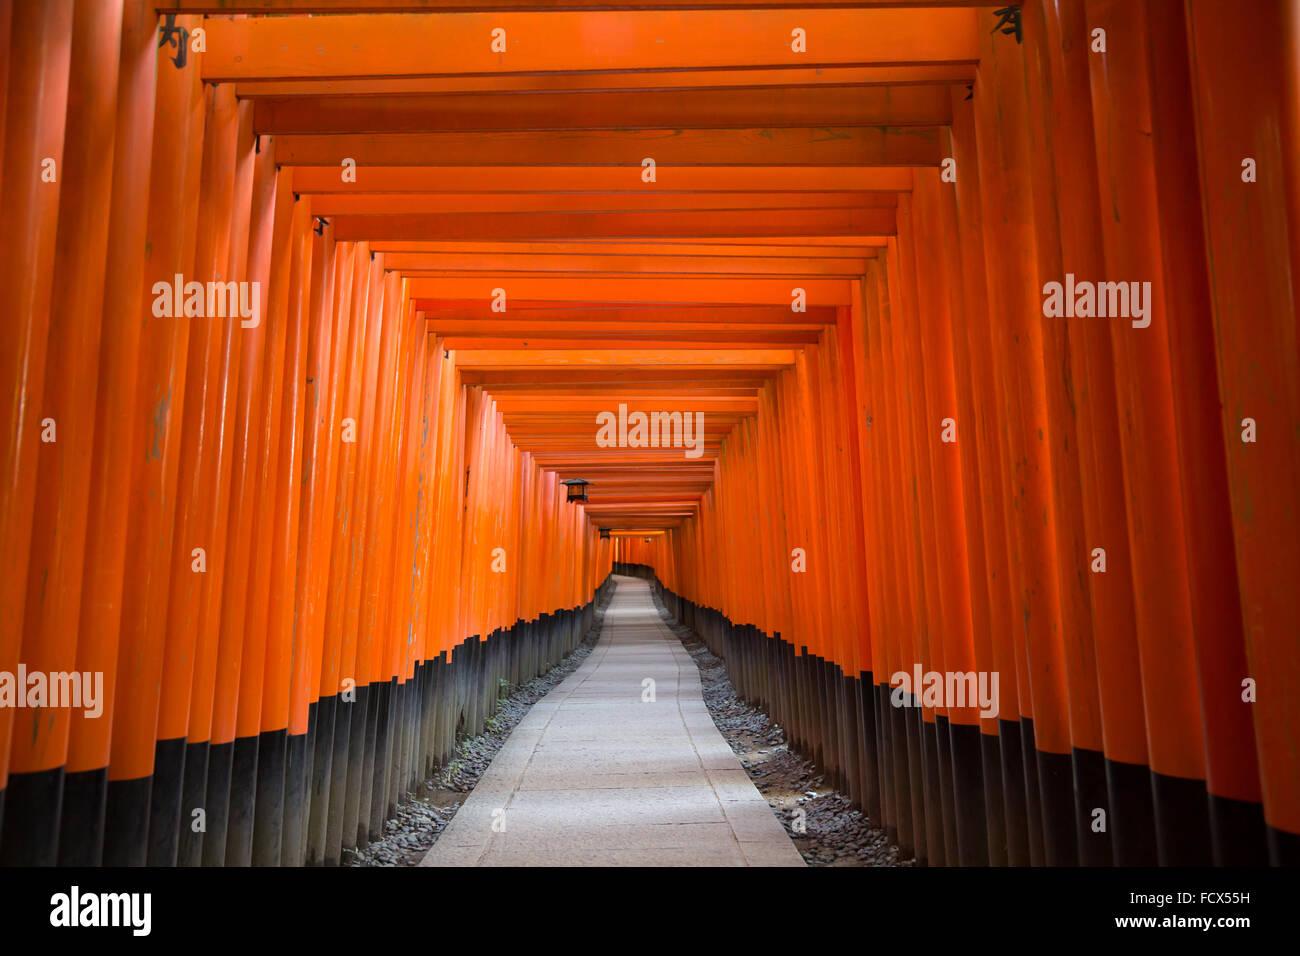 Lo Shintoismo giapponese tempio di Kyoto - Fushimi Inari Santuario (Fushimi Inari Taisha) Immagini Stock